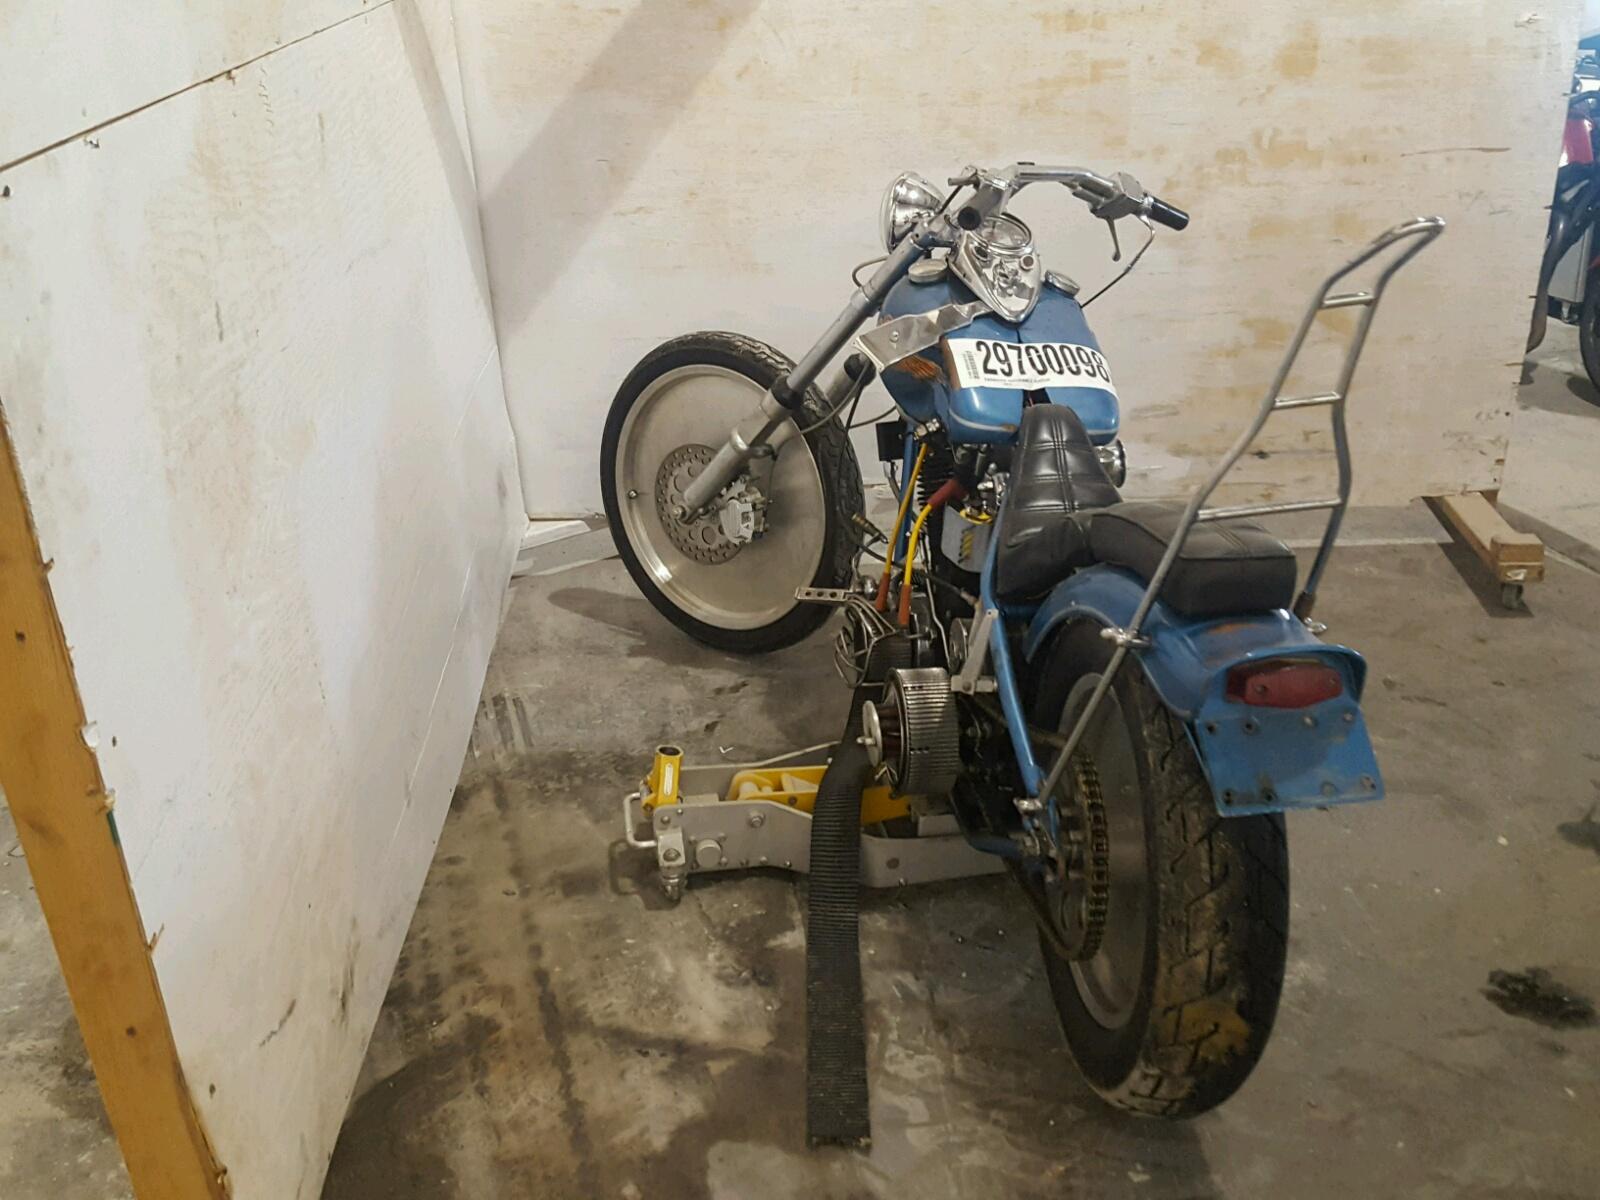 1978 Harley-Davidson Shovelhead - Frame Damage Damage - 2A95642H8 (Sold)